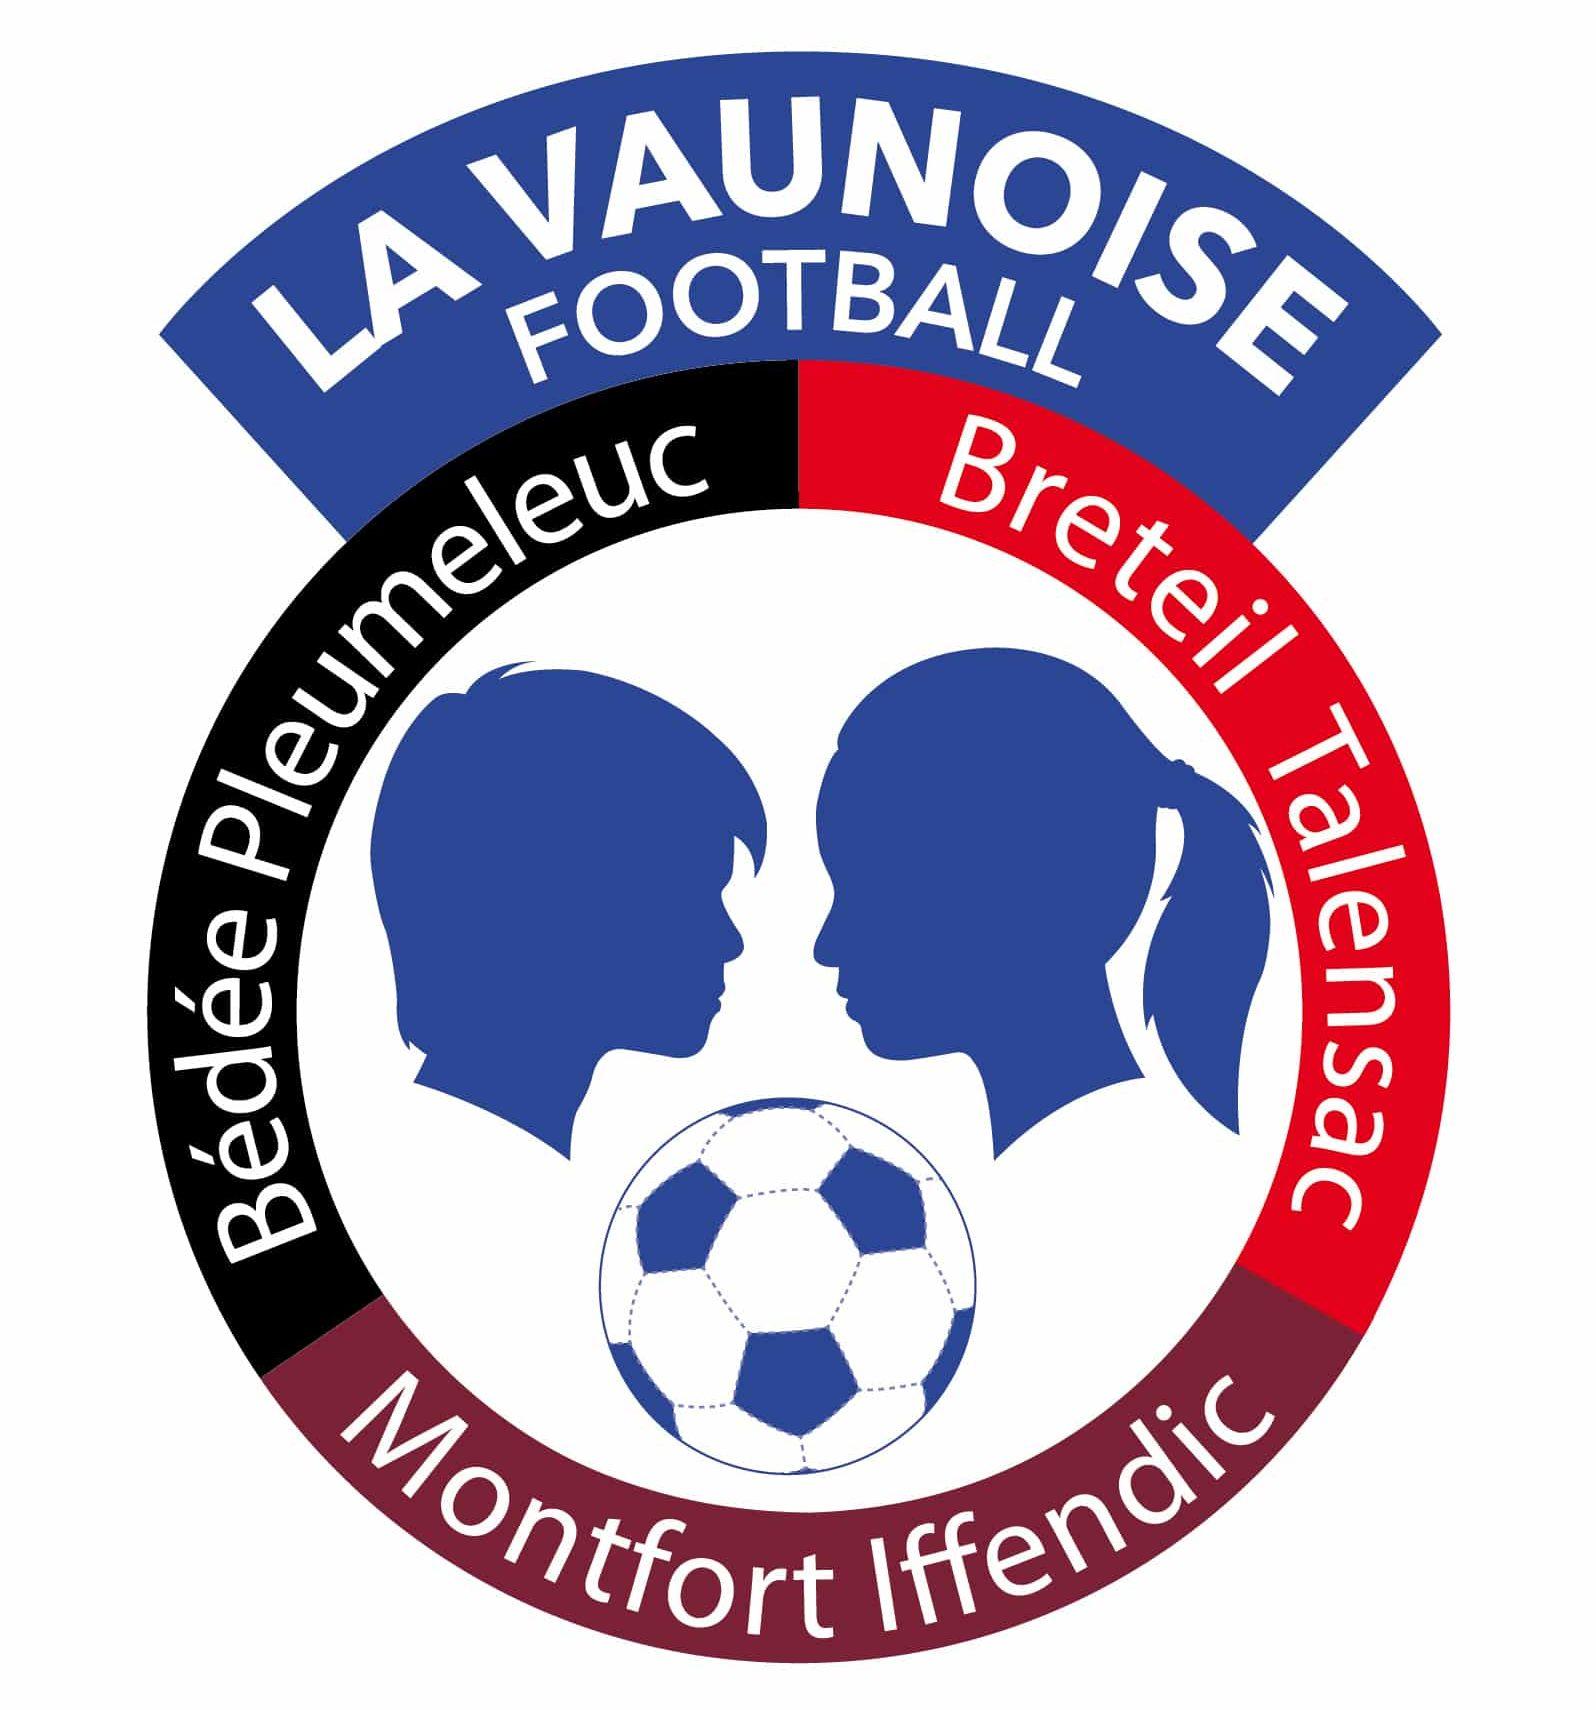 GJ La Vaunoise Football